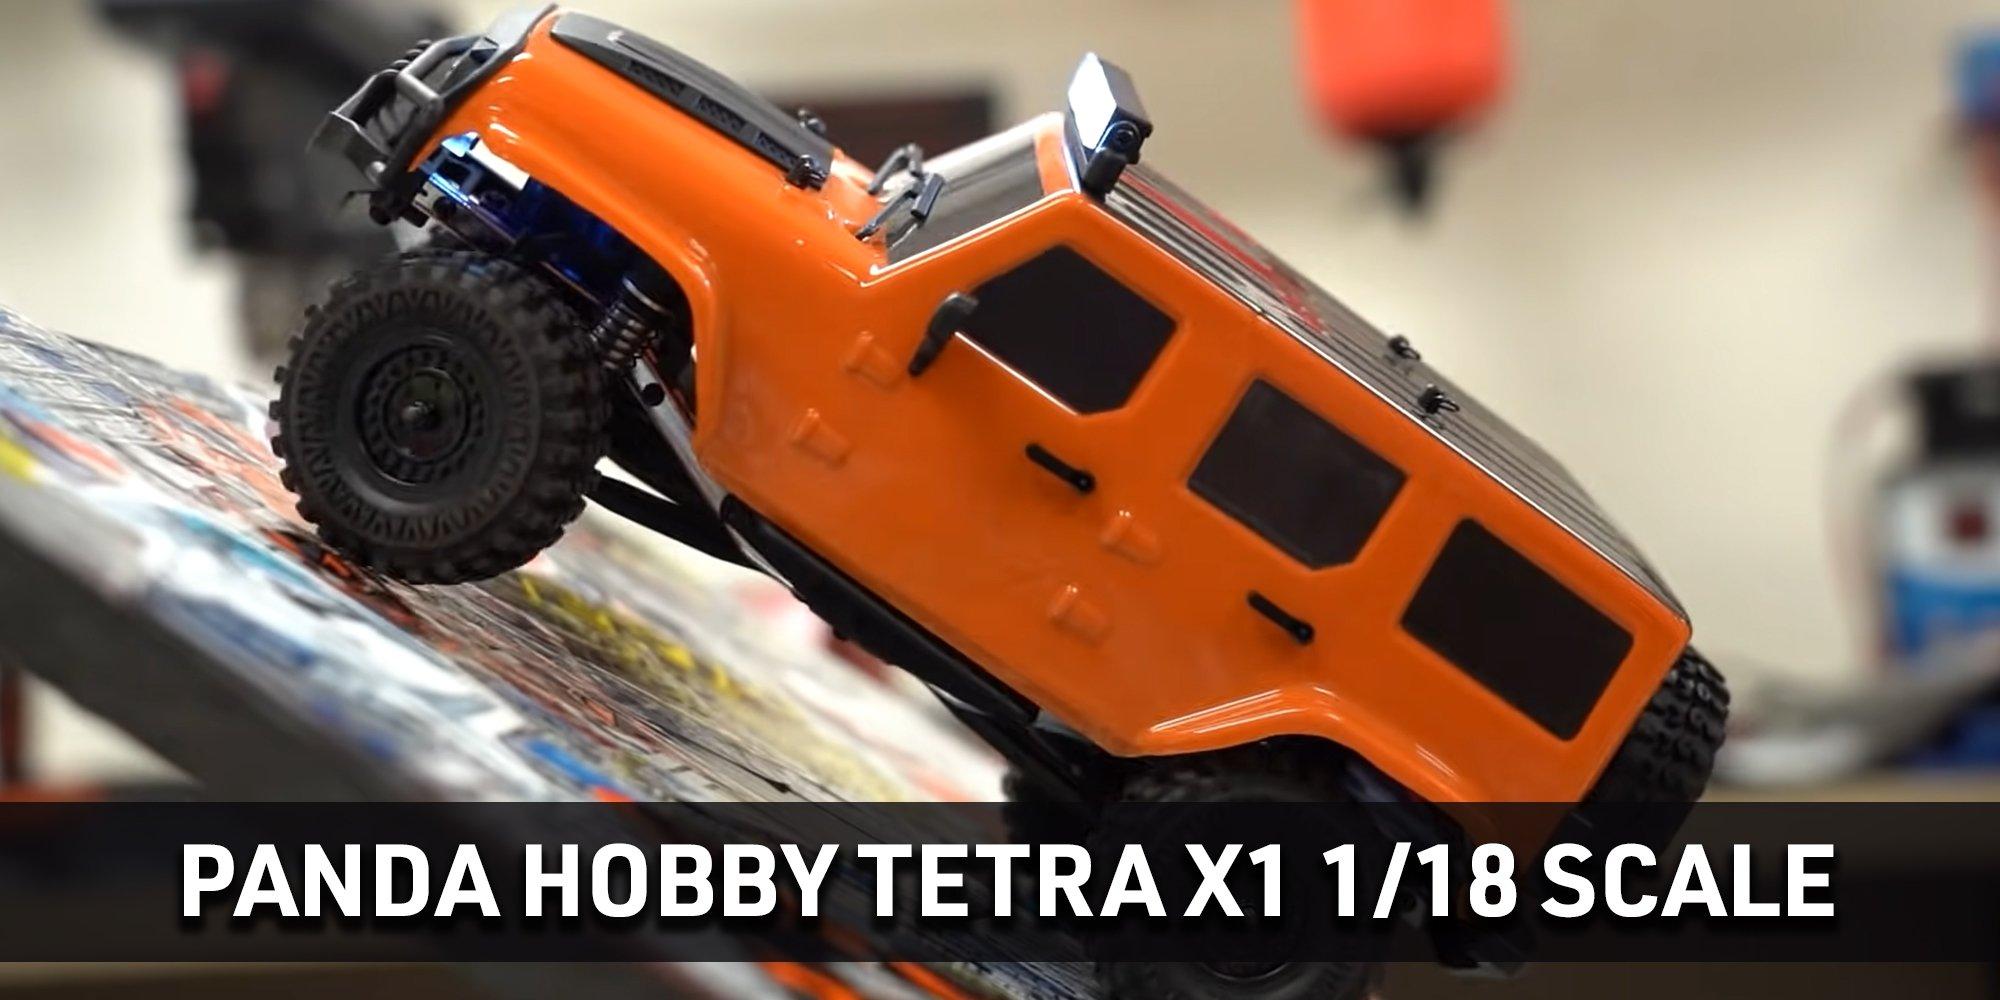 Panda Hobby Tetra X1 with Orange Body